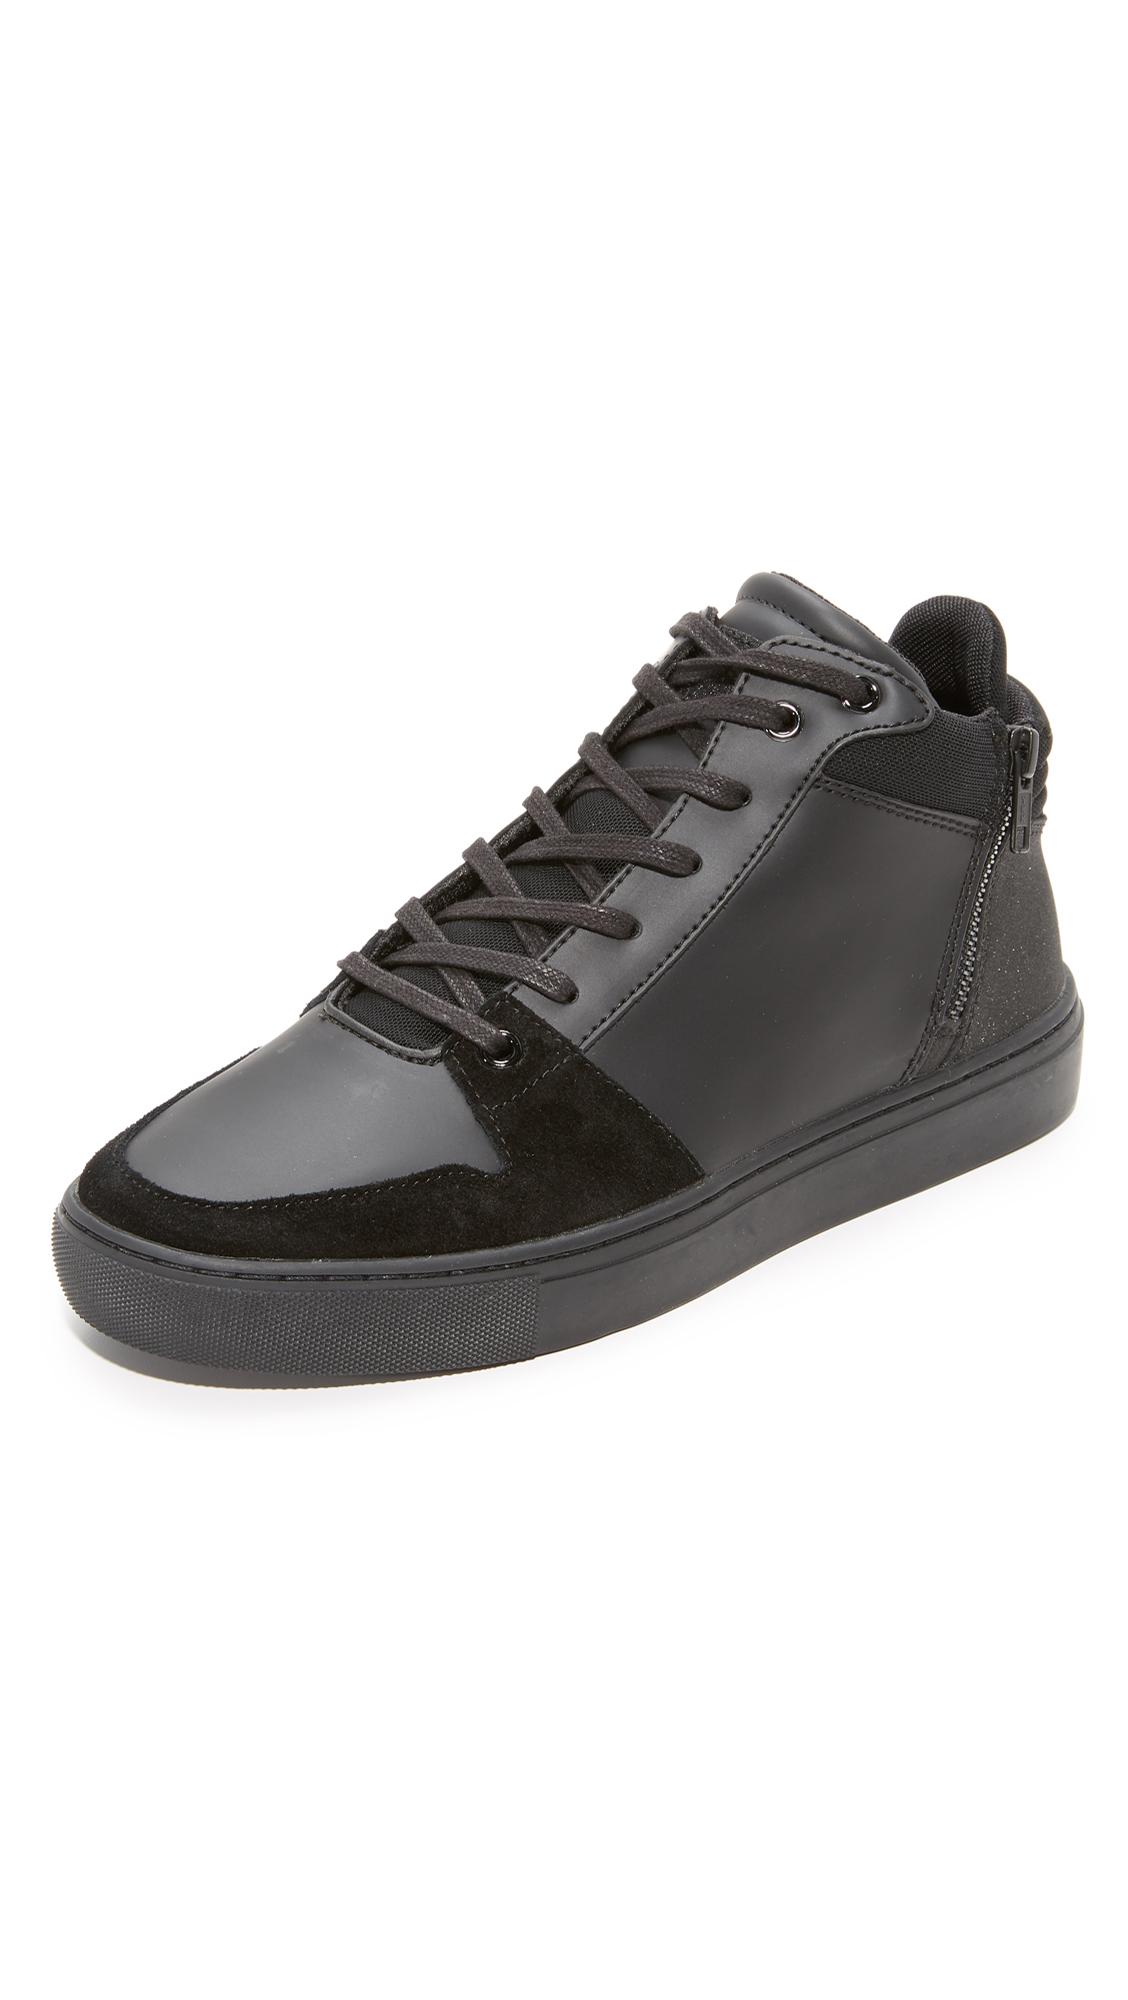 Creative Recreation Modena Zip High Top Sneakers In Black Modesens